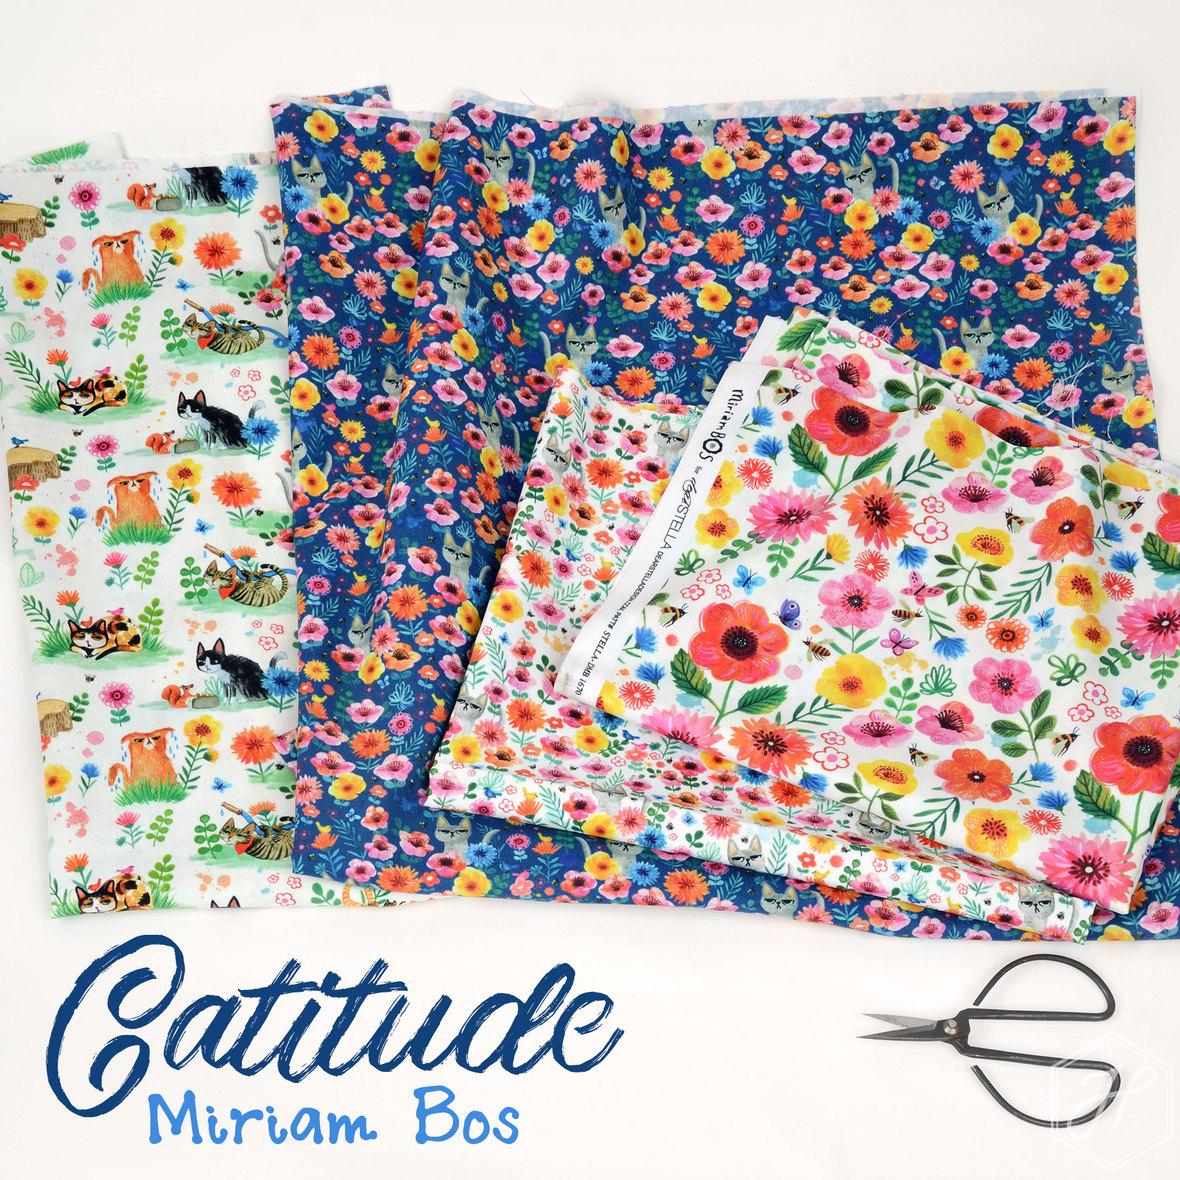 Catitude-Fabric-Miriam-Bos-and-Dear-Stella-at-Hawthorne-Supply-Co